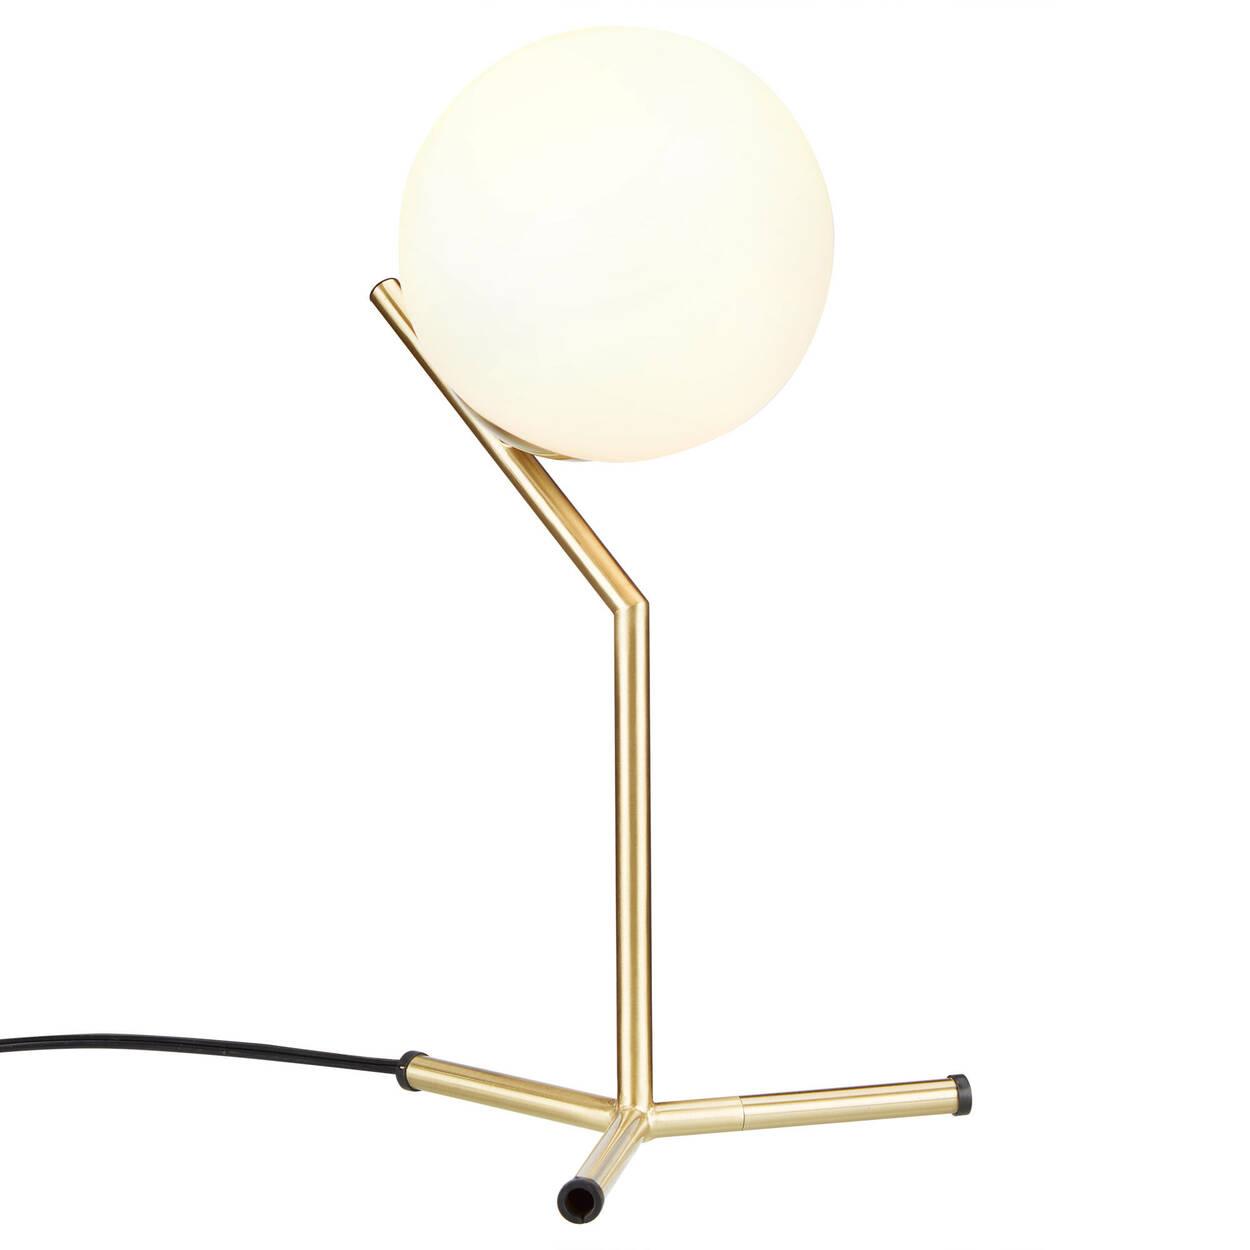 Lampe de table en métal et en verre